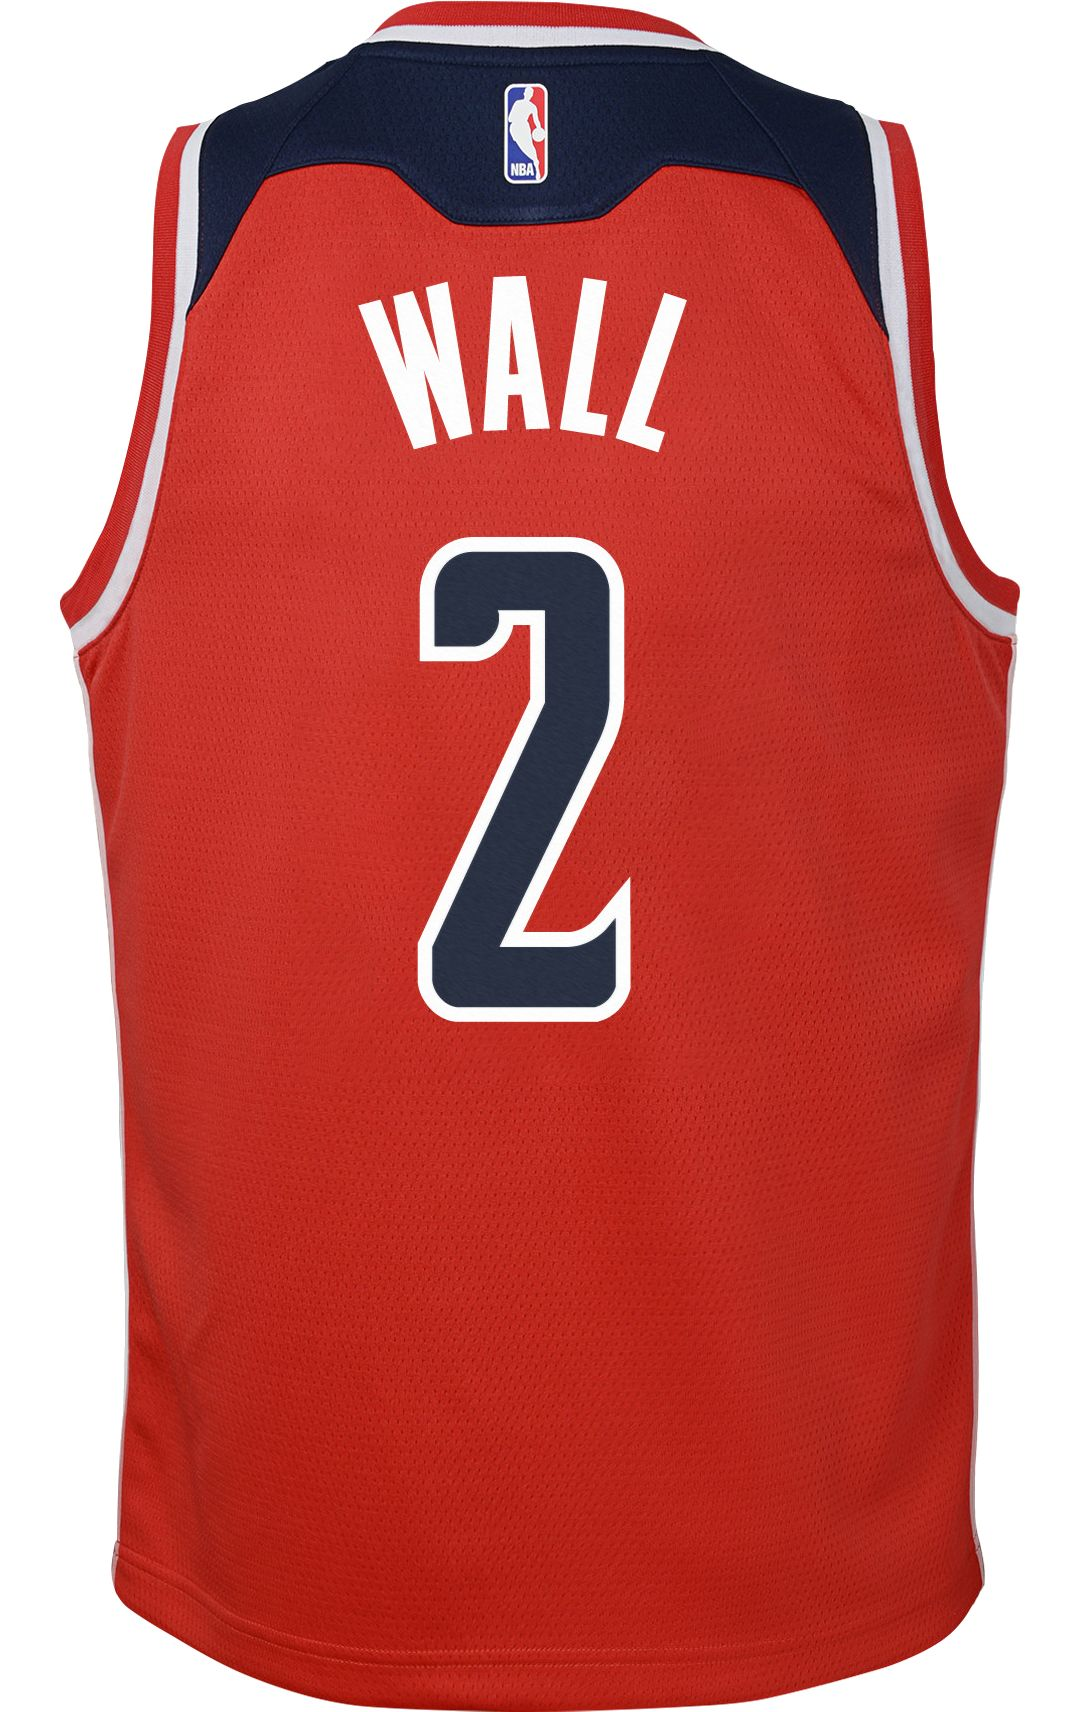 68f55653 Nike Youth Washington Wizards John Wall #2 Red Dri-FIT Swingman ...